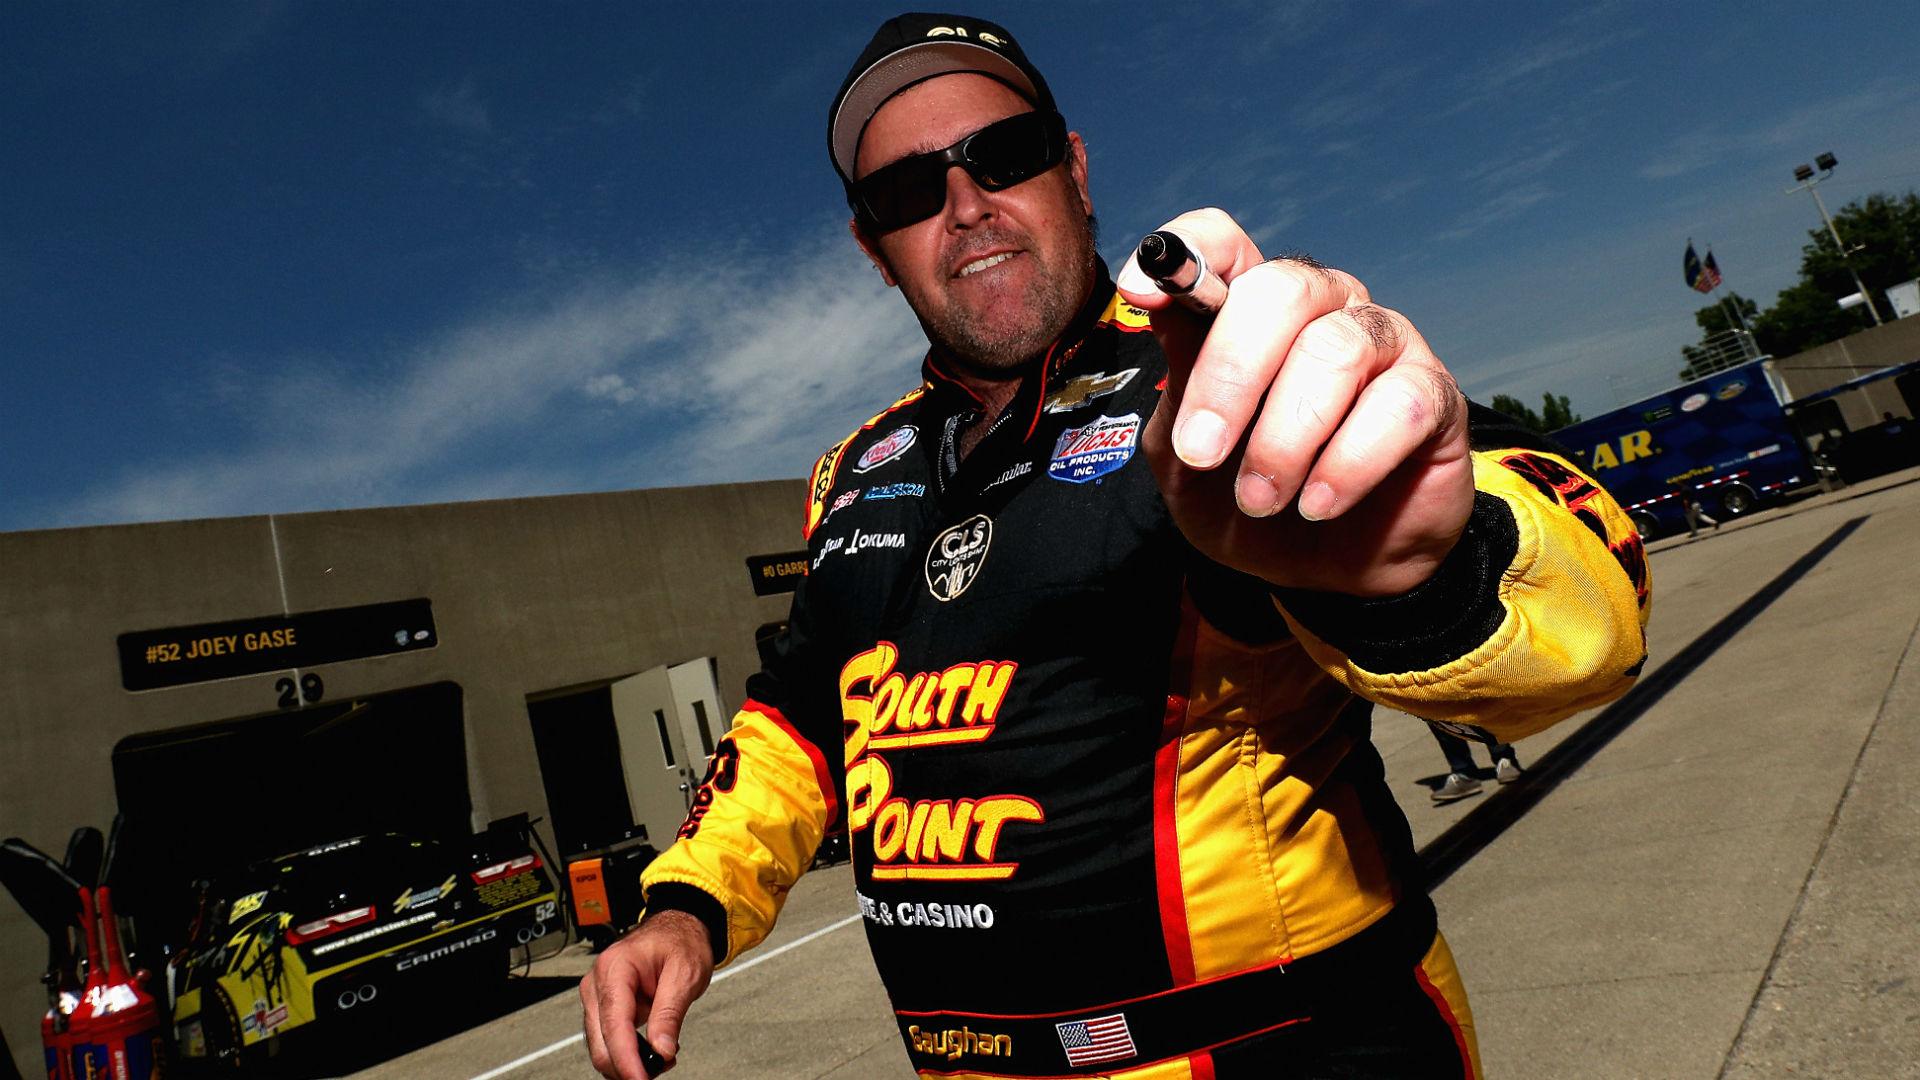 NASCAR at Talladega: Brendan Gaughan cracks jokes after flipping in wild crash